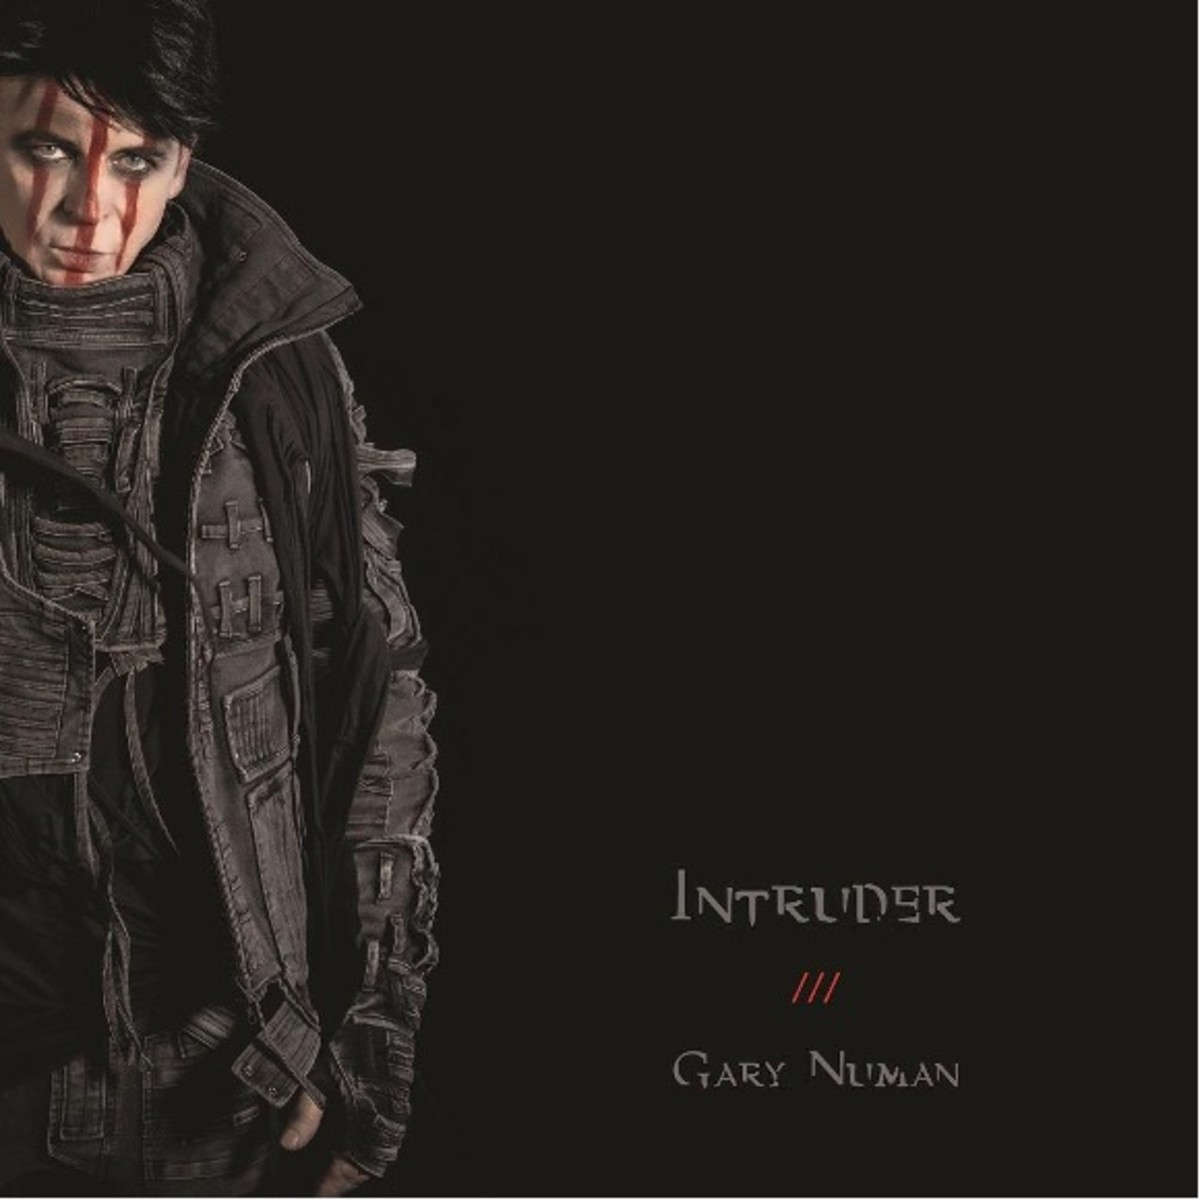 Gary Numan -- Intruder album cover art